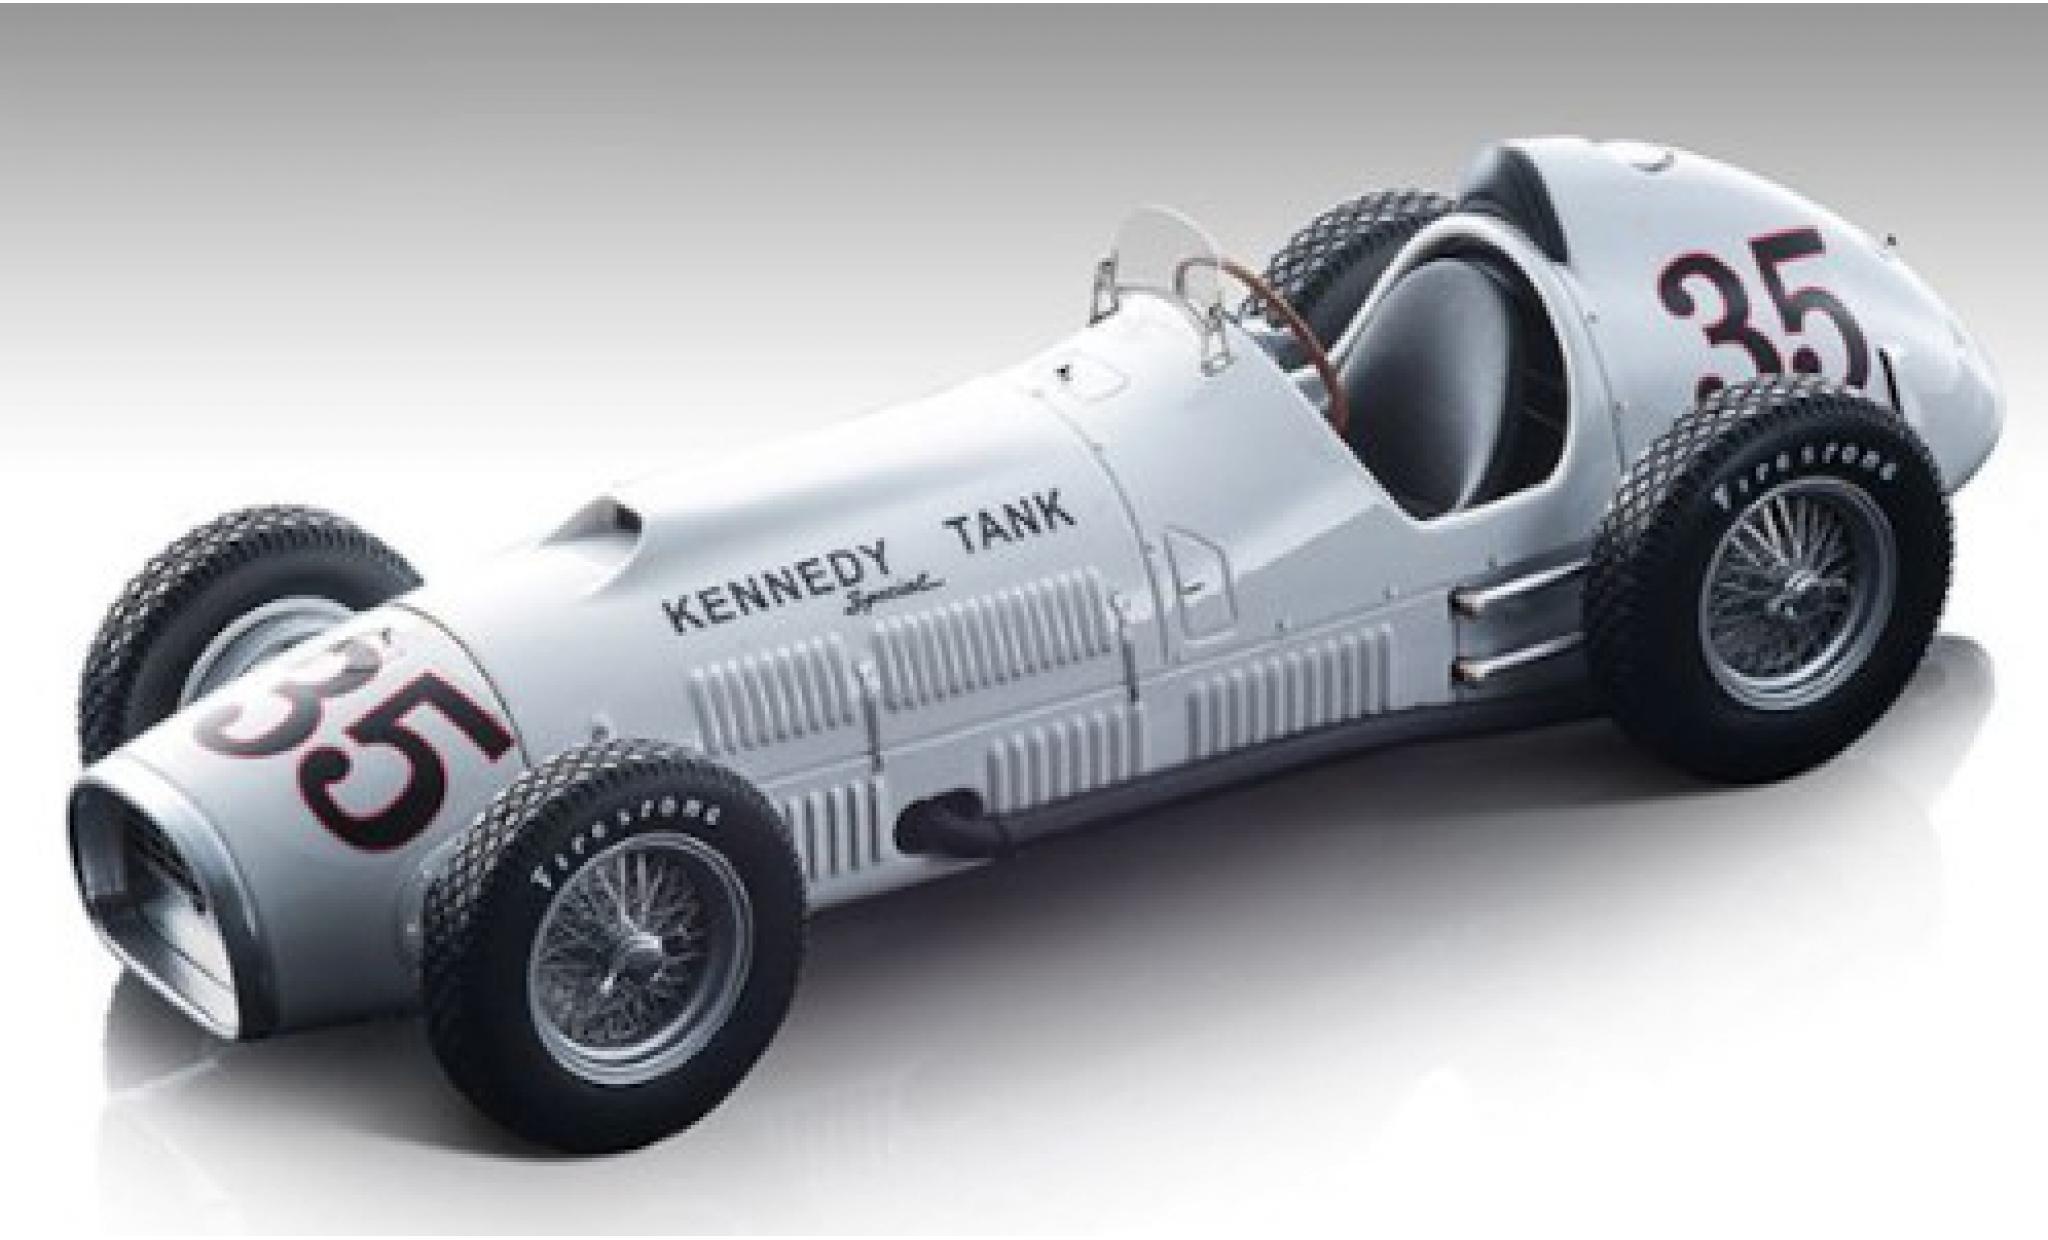 Ferrari 375 1/18 Tecnomodel Indianapolis No.35 Automobil Weltmeisterschaft Indianapolis 500 1952 J.Mauro